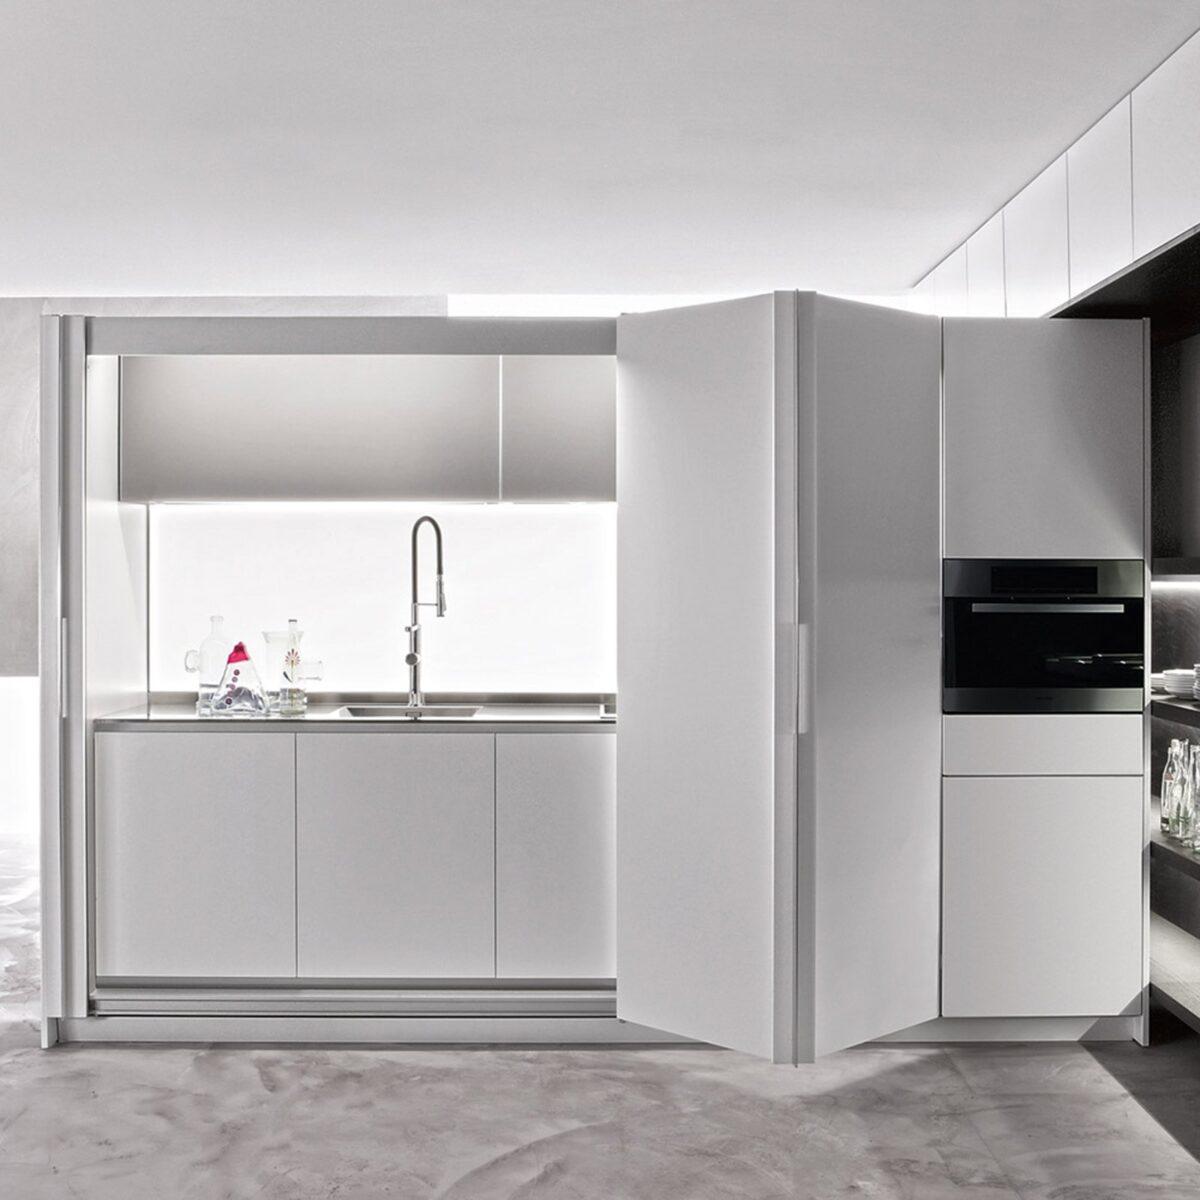 Cucina moderna piccola: idee